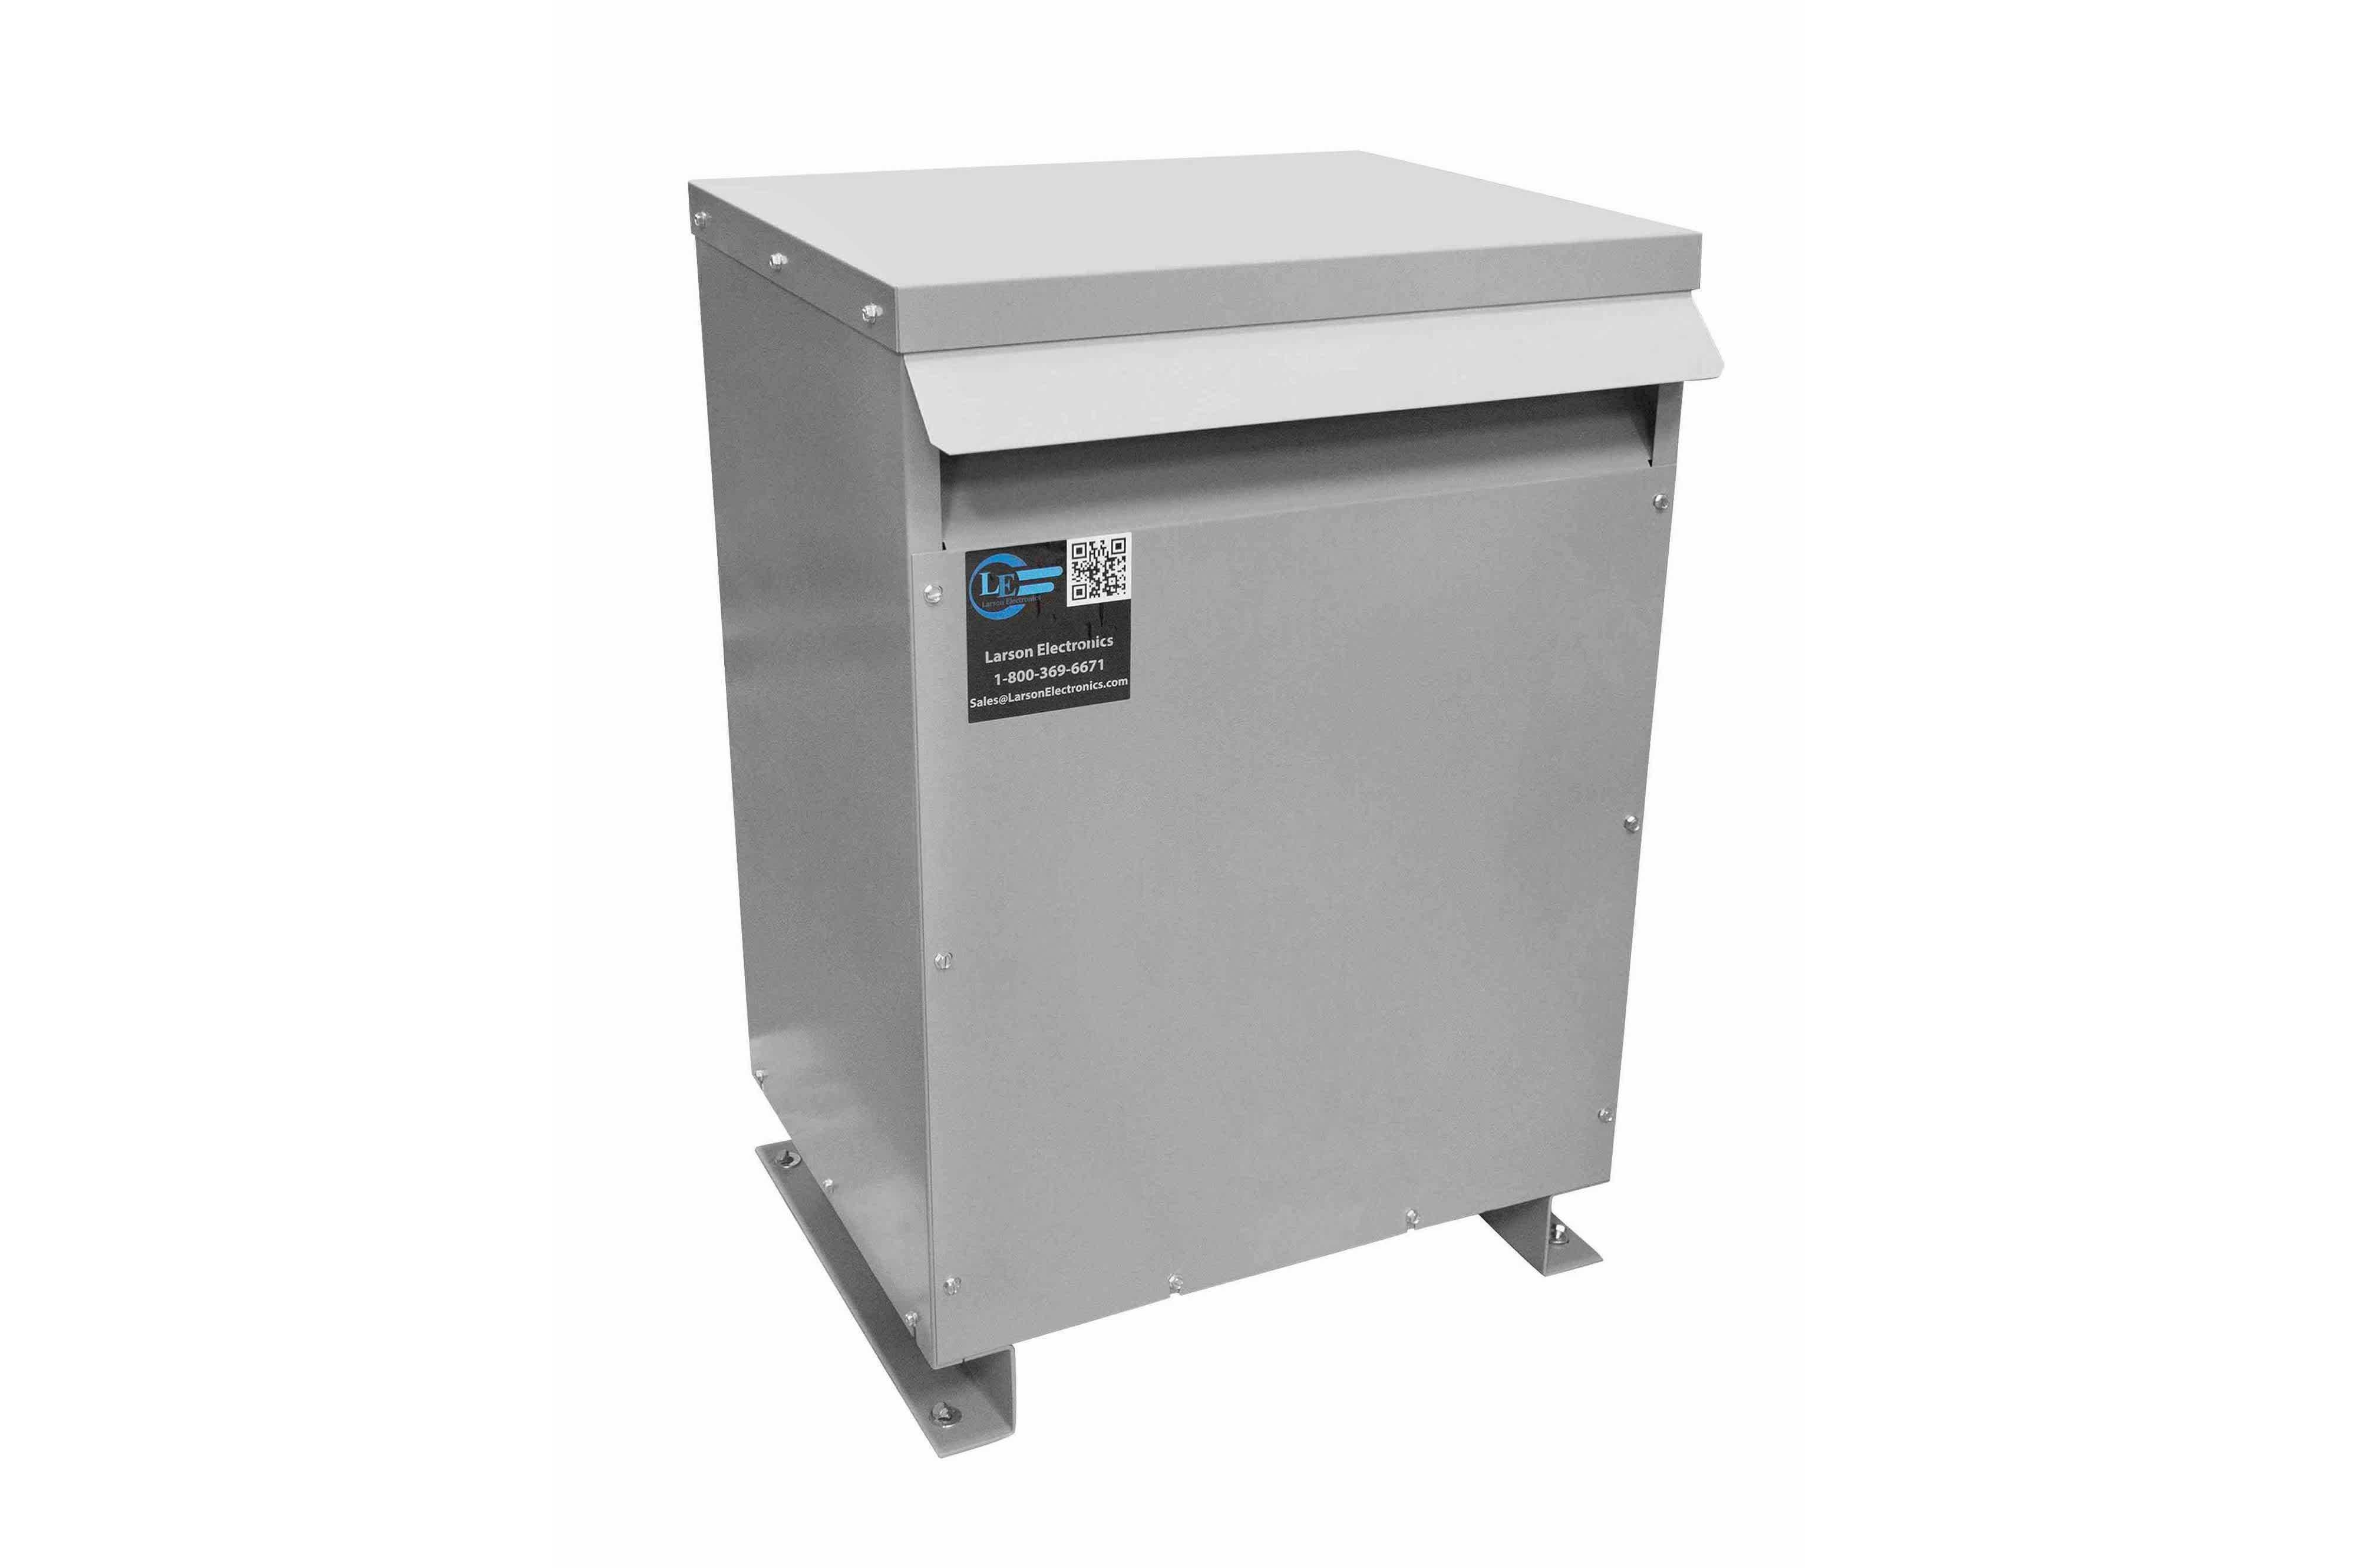 300 kVA 3PH DOE Transformer, 480V Delta Primary, 575Y/332 Wye-N Secondary, N3R, Ventilated, 60 Hz